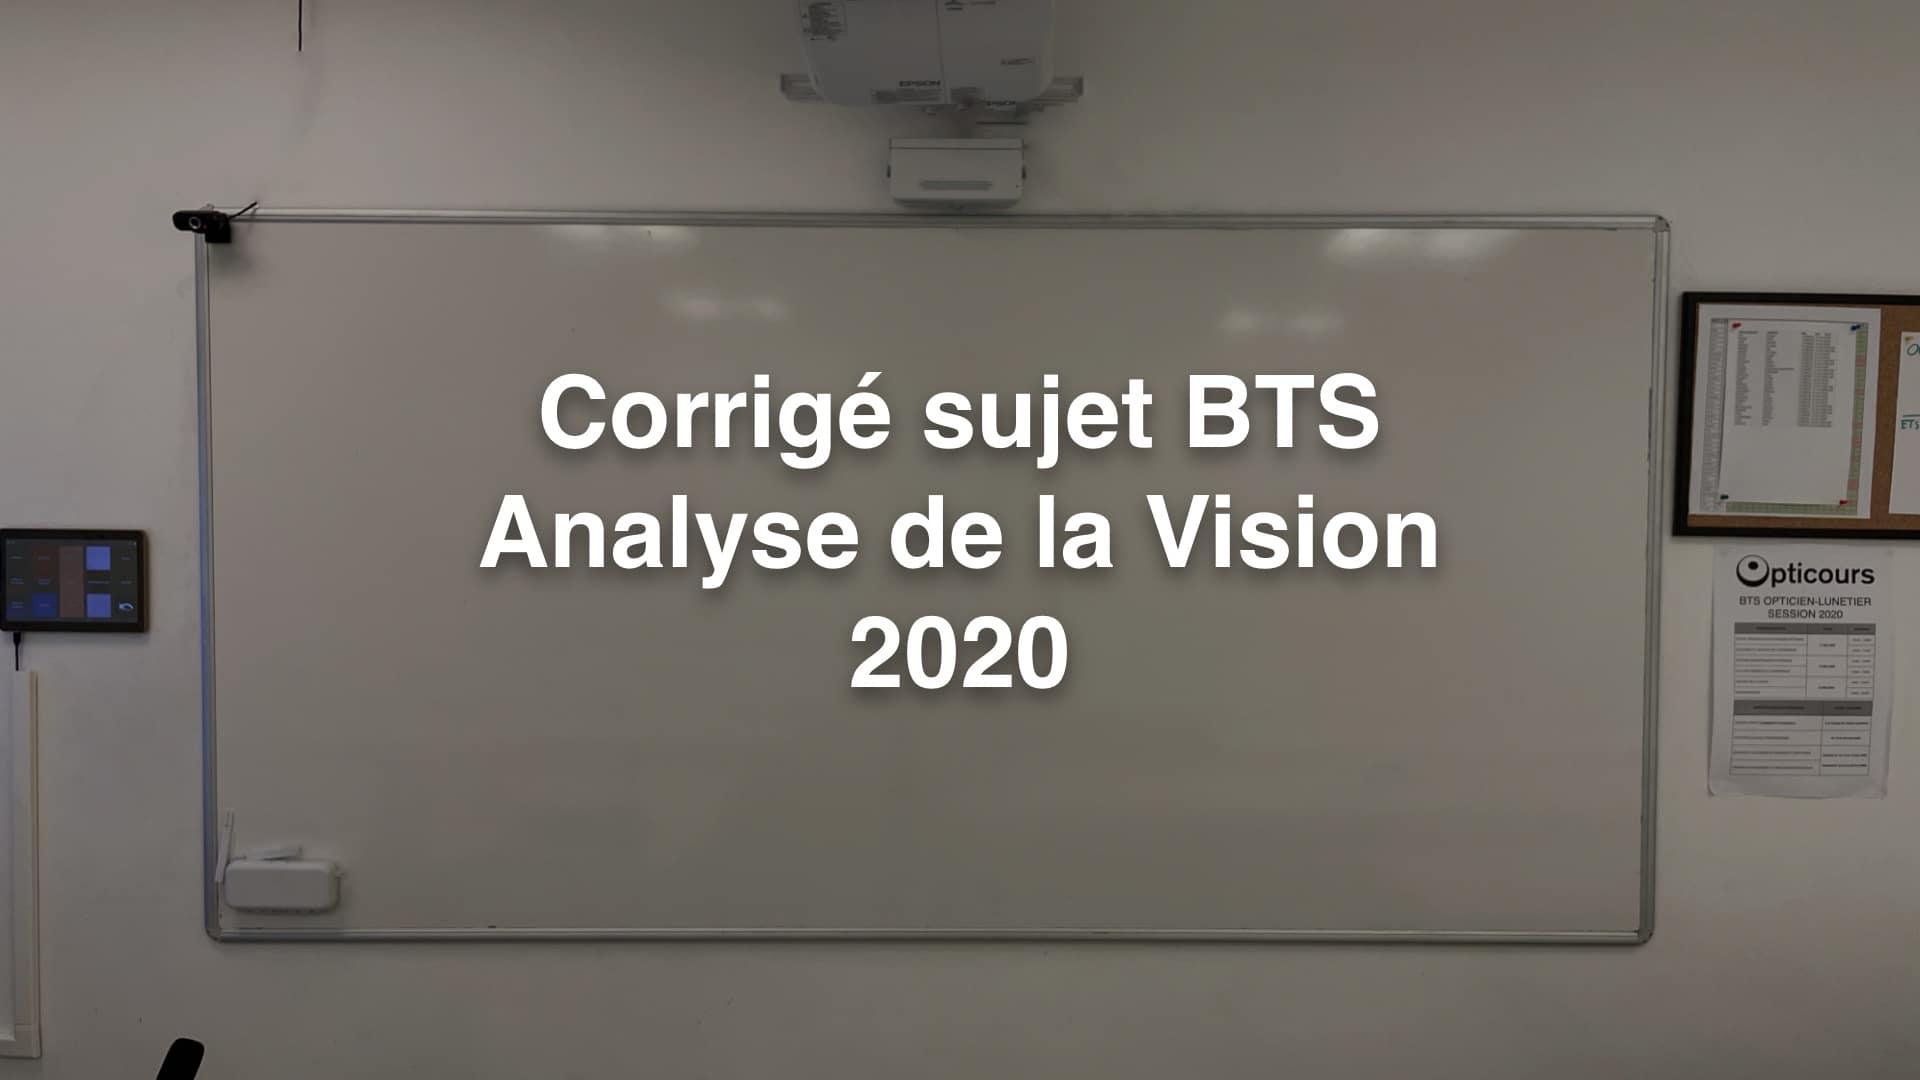 Corrigé sujet BTS Analyse Vision 2020